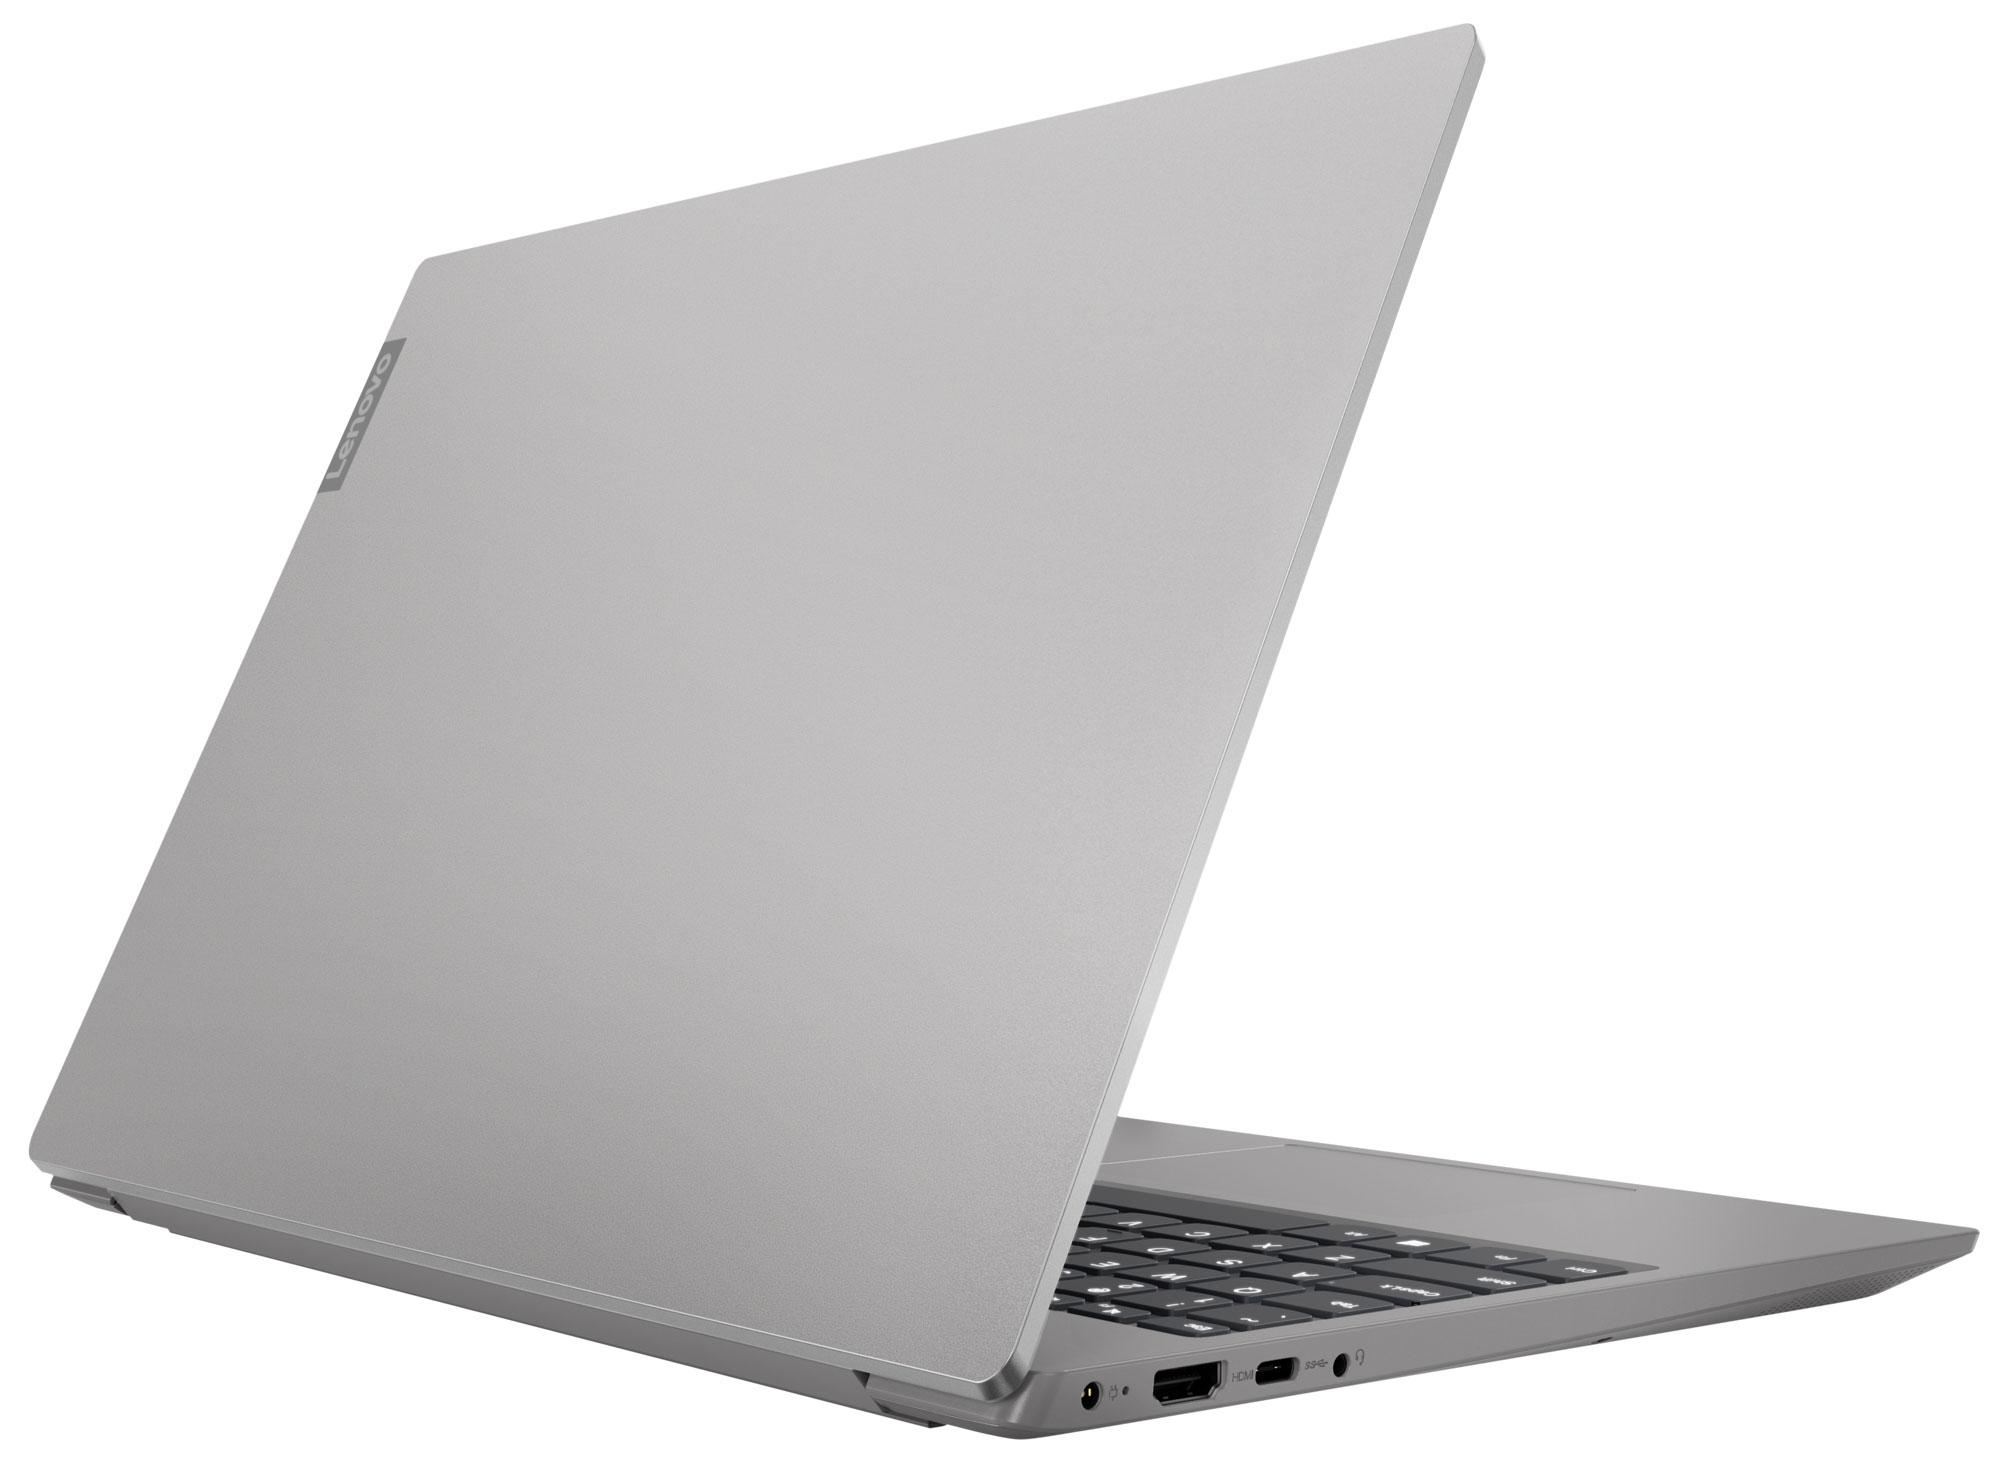 Фото  Ноутбук Lenovo ideapad S340-15IWL Platinum Grey (81N800BMRE)